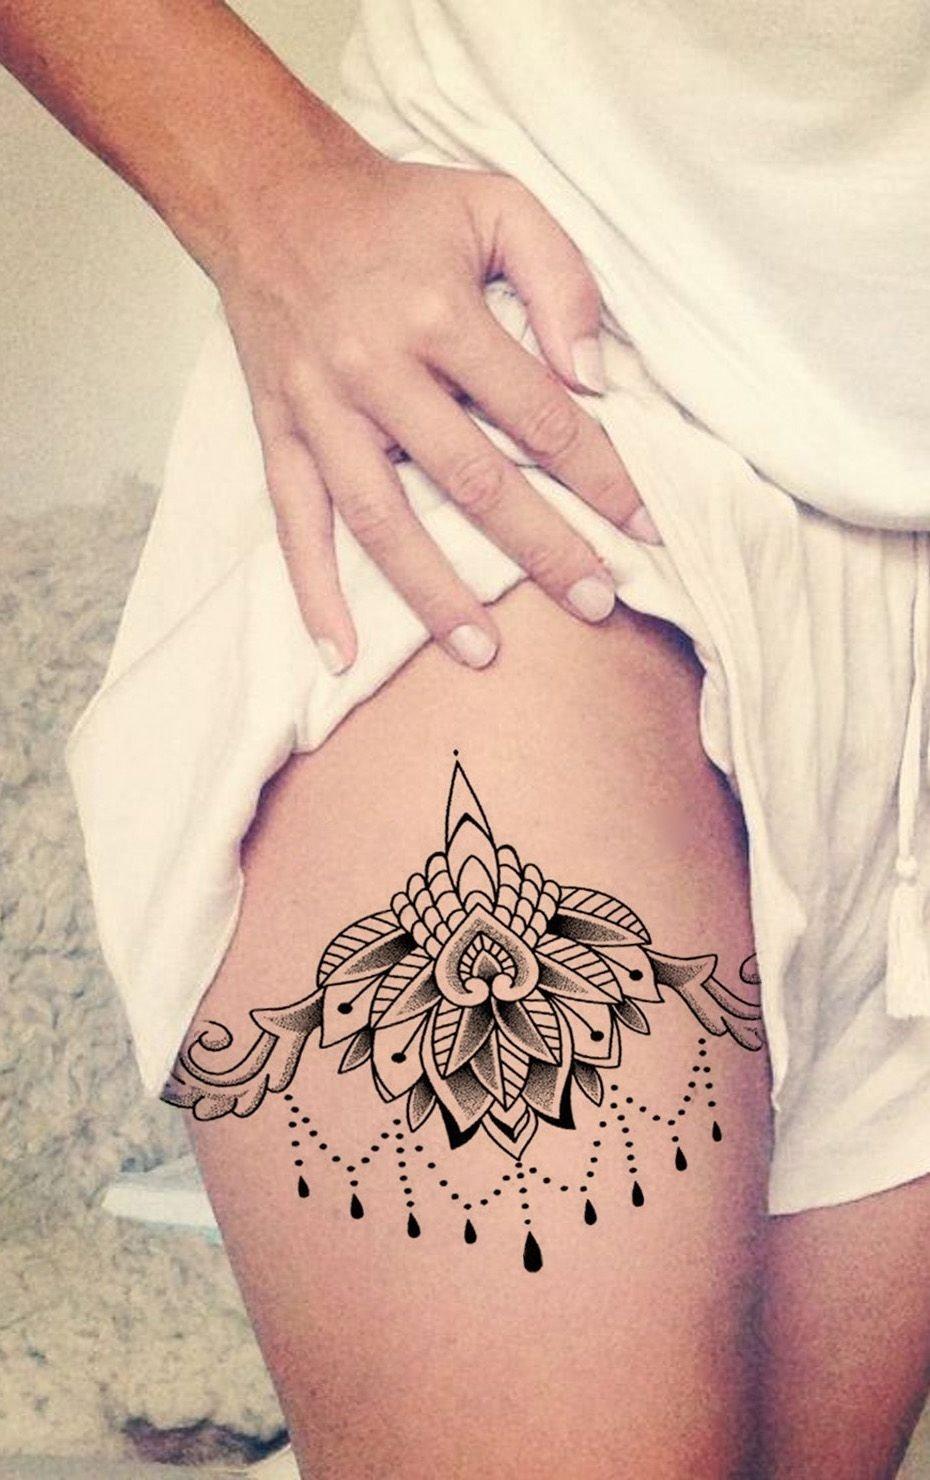 10 Fashionable Tattoo Placement Ideas For Women ceylon lace lotus chandelier temporary tattoo black henna hennas 2020